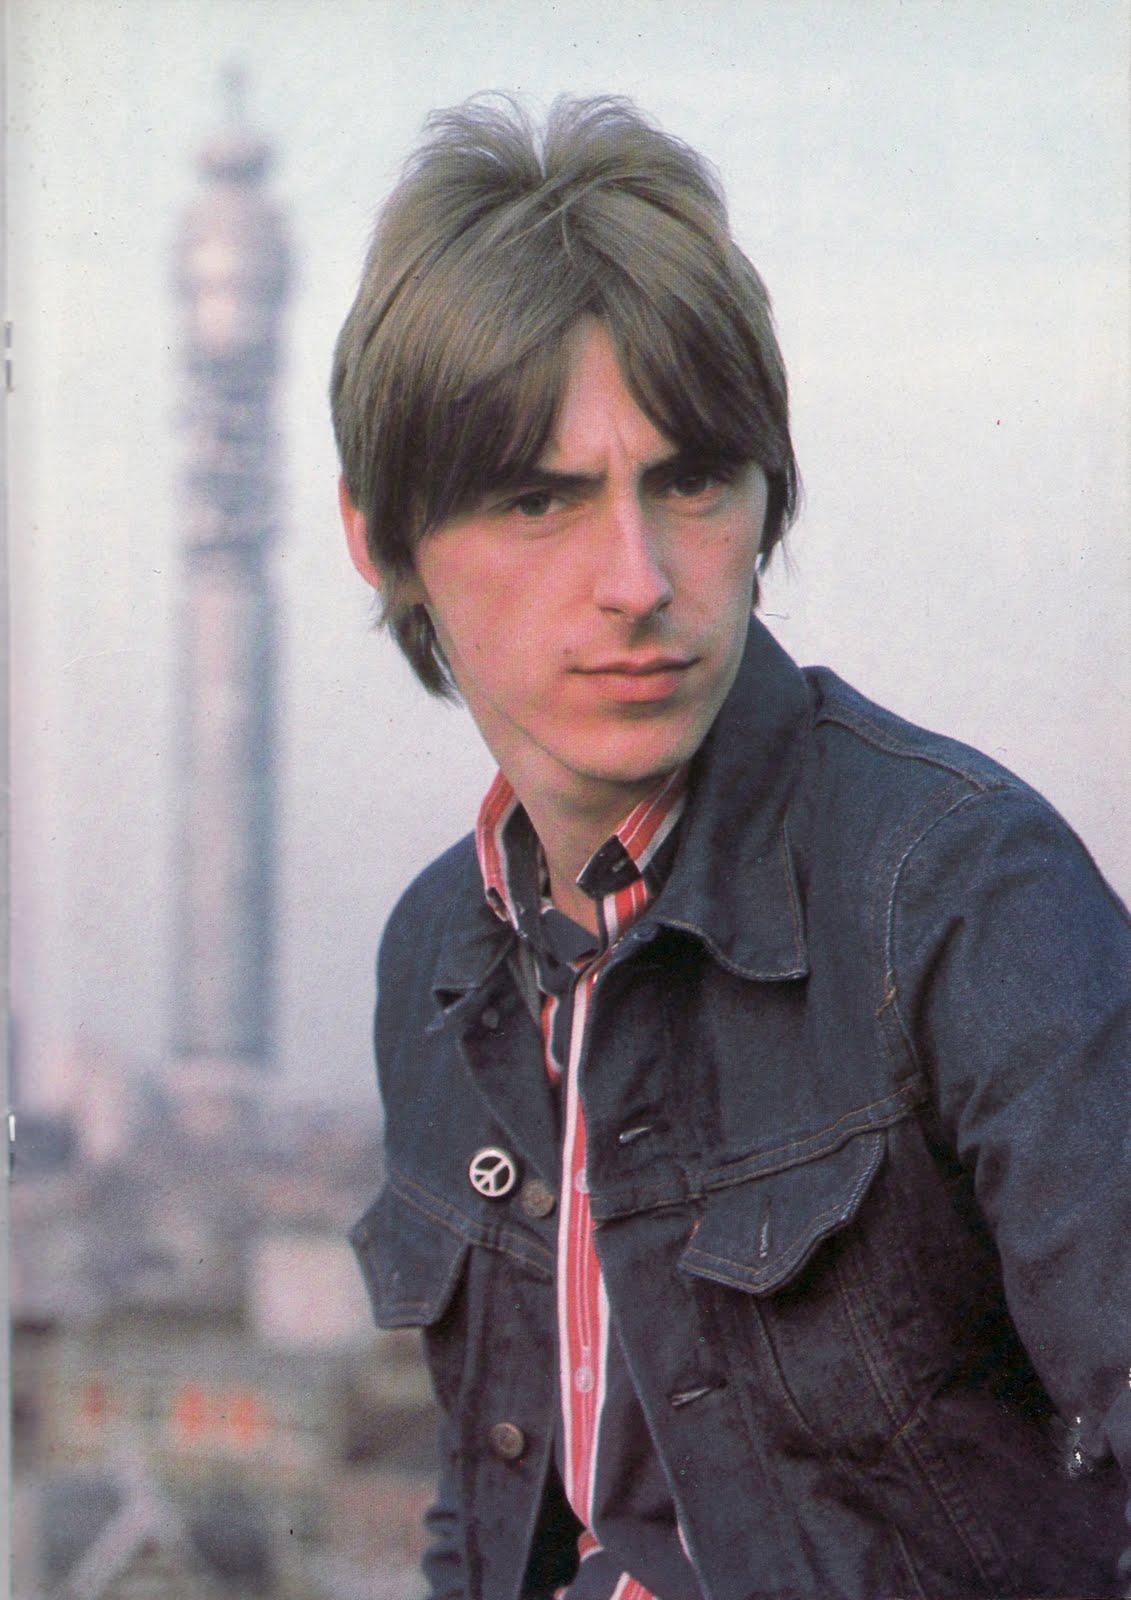 Musings From The Marsh...: Happy Birthday, Paul Weller